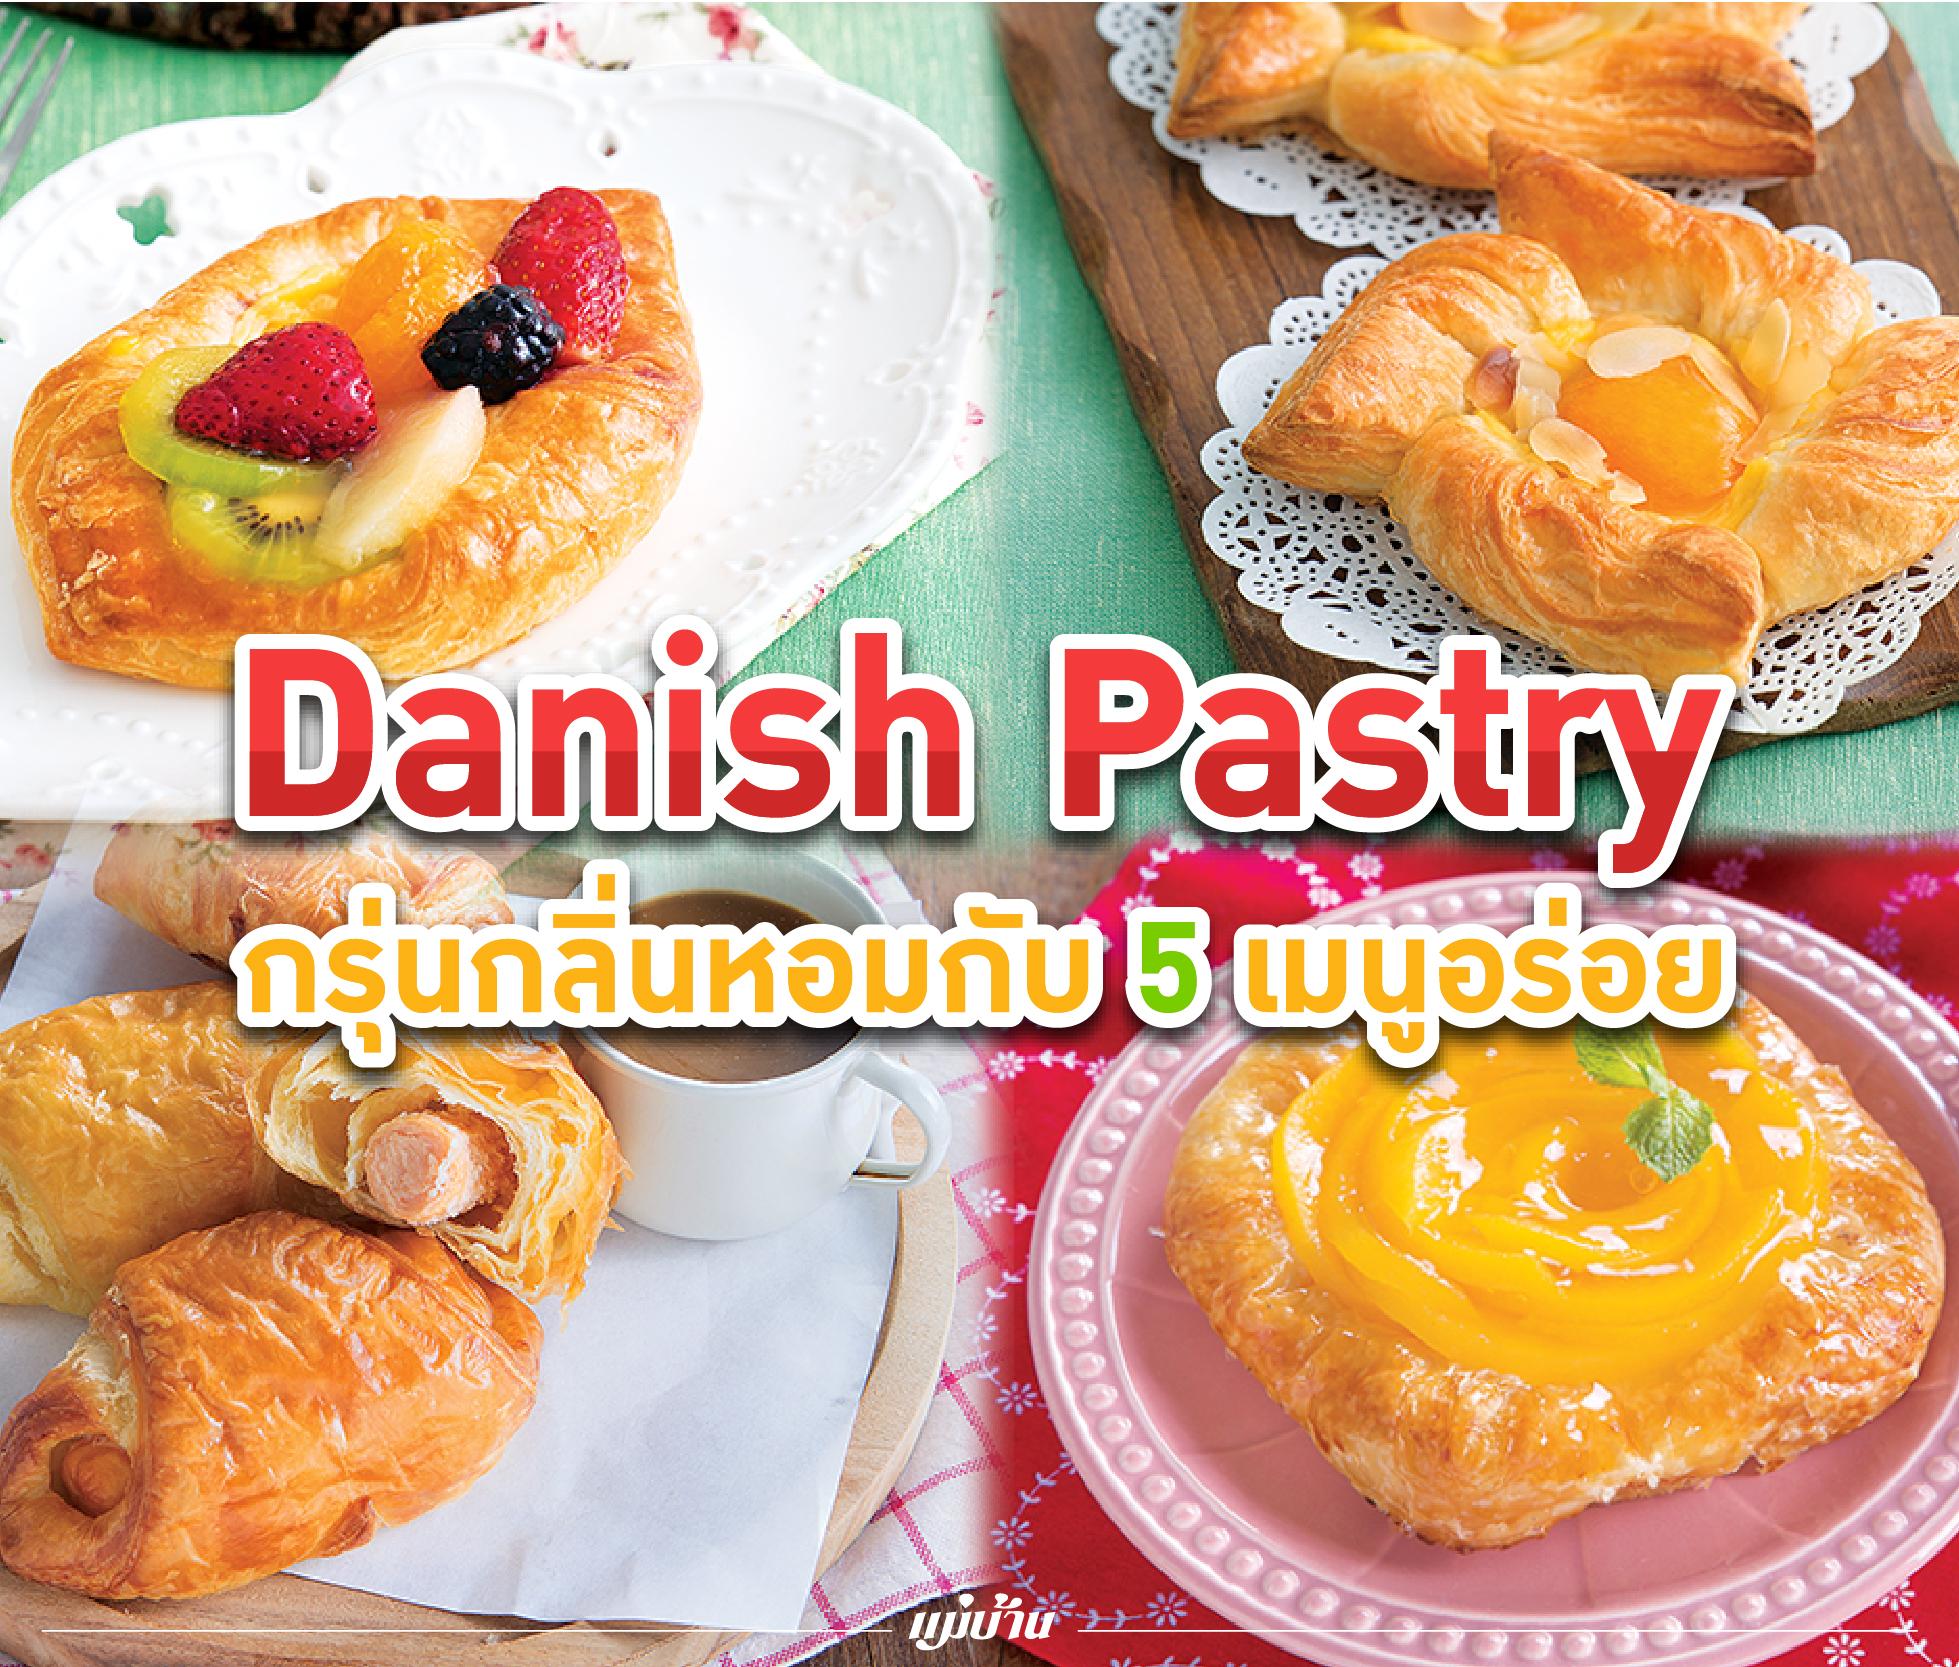 Danish Pastry กรุ่นกลิ่นหอมกับ 5 เมนูอร่อย  สำนักพิมพ์แม่บ้าน